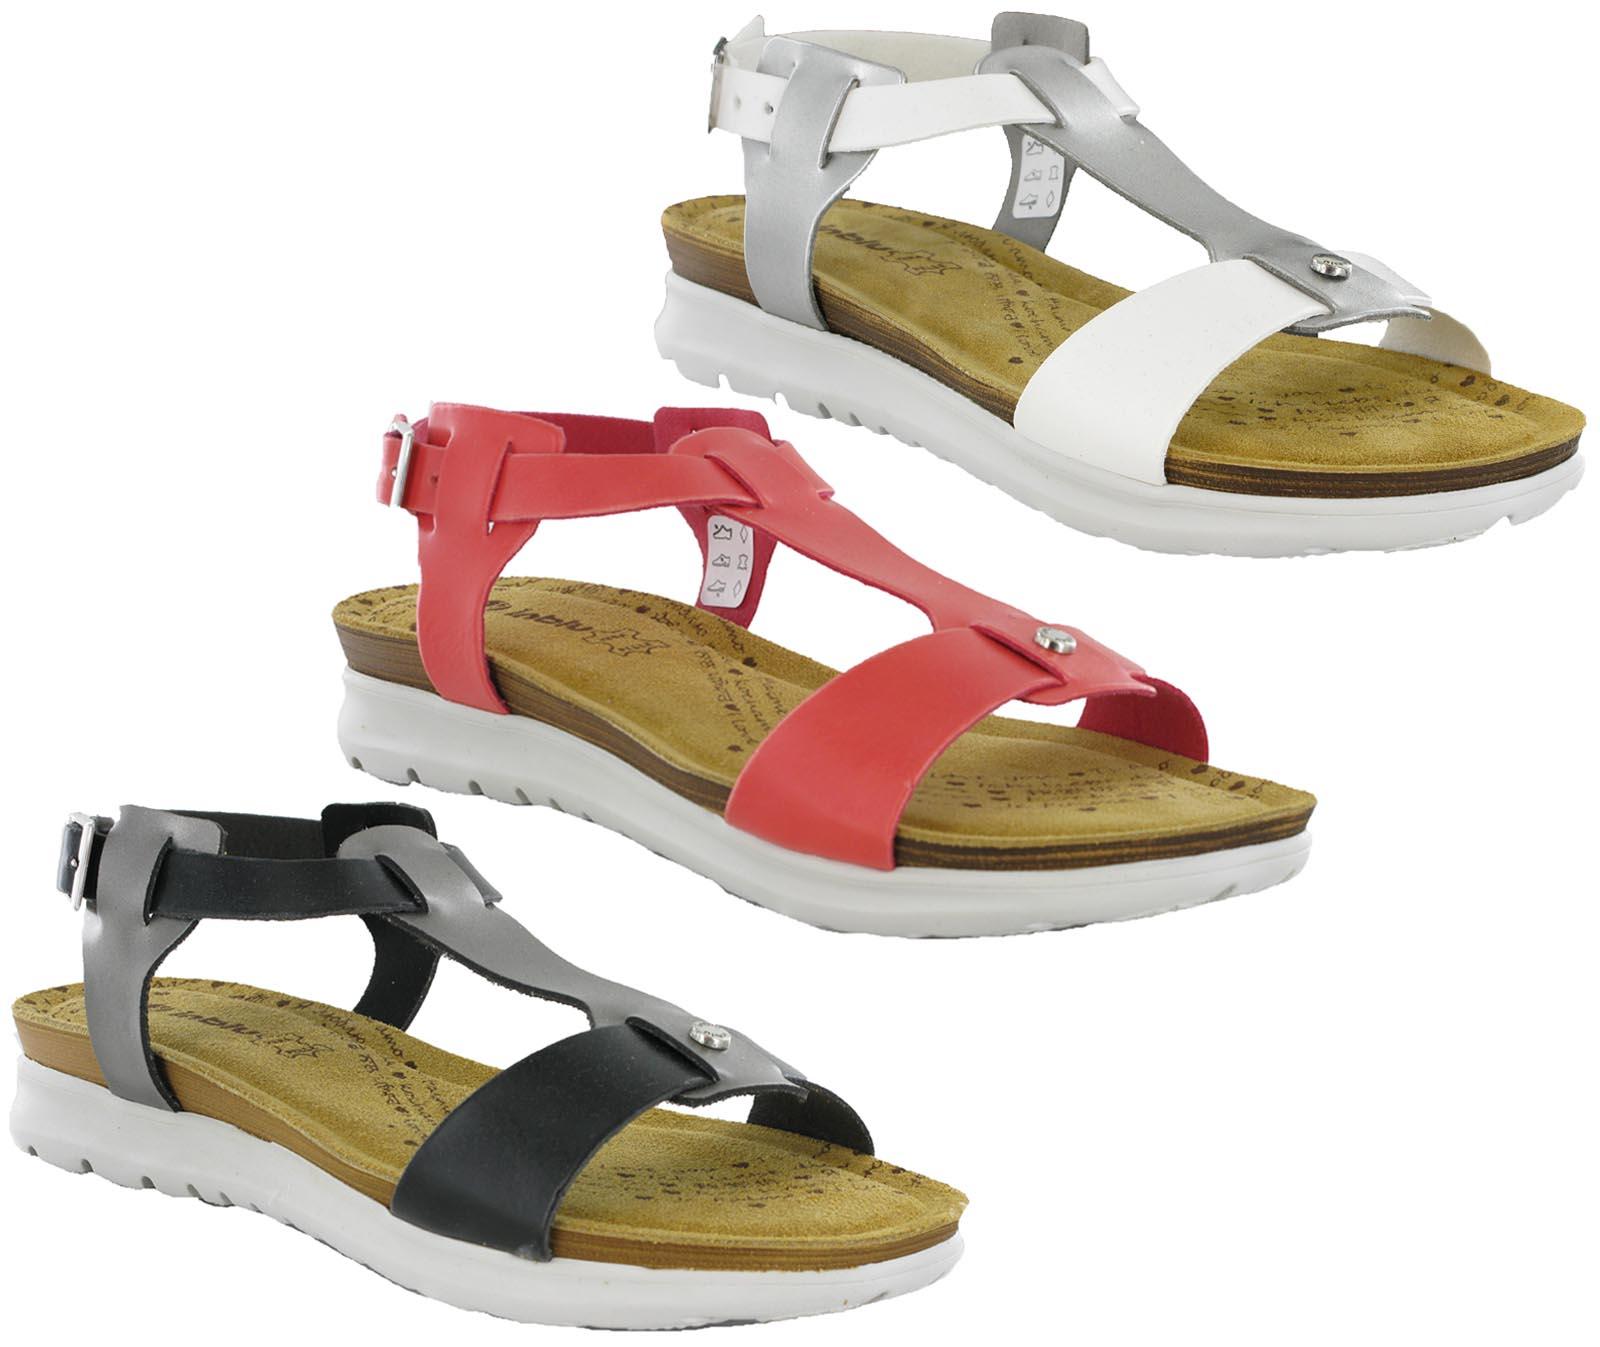 Sandals shoes summer - Womens Inblu Leather Insock Open Toe Comfort Buckle Summer Sandals Shoes Uk 3 8